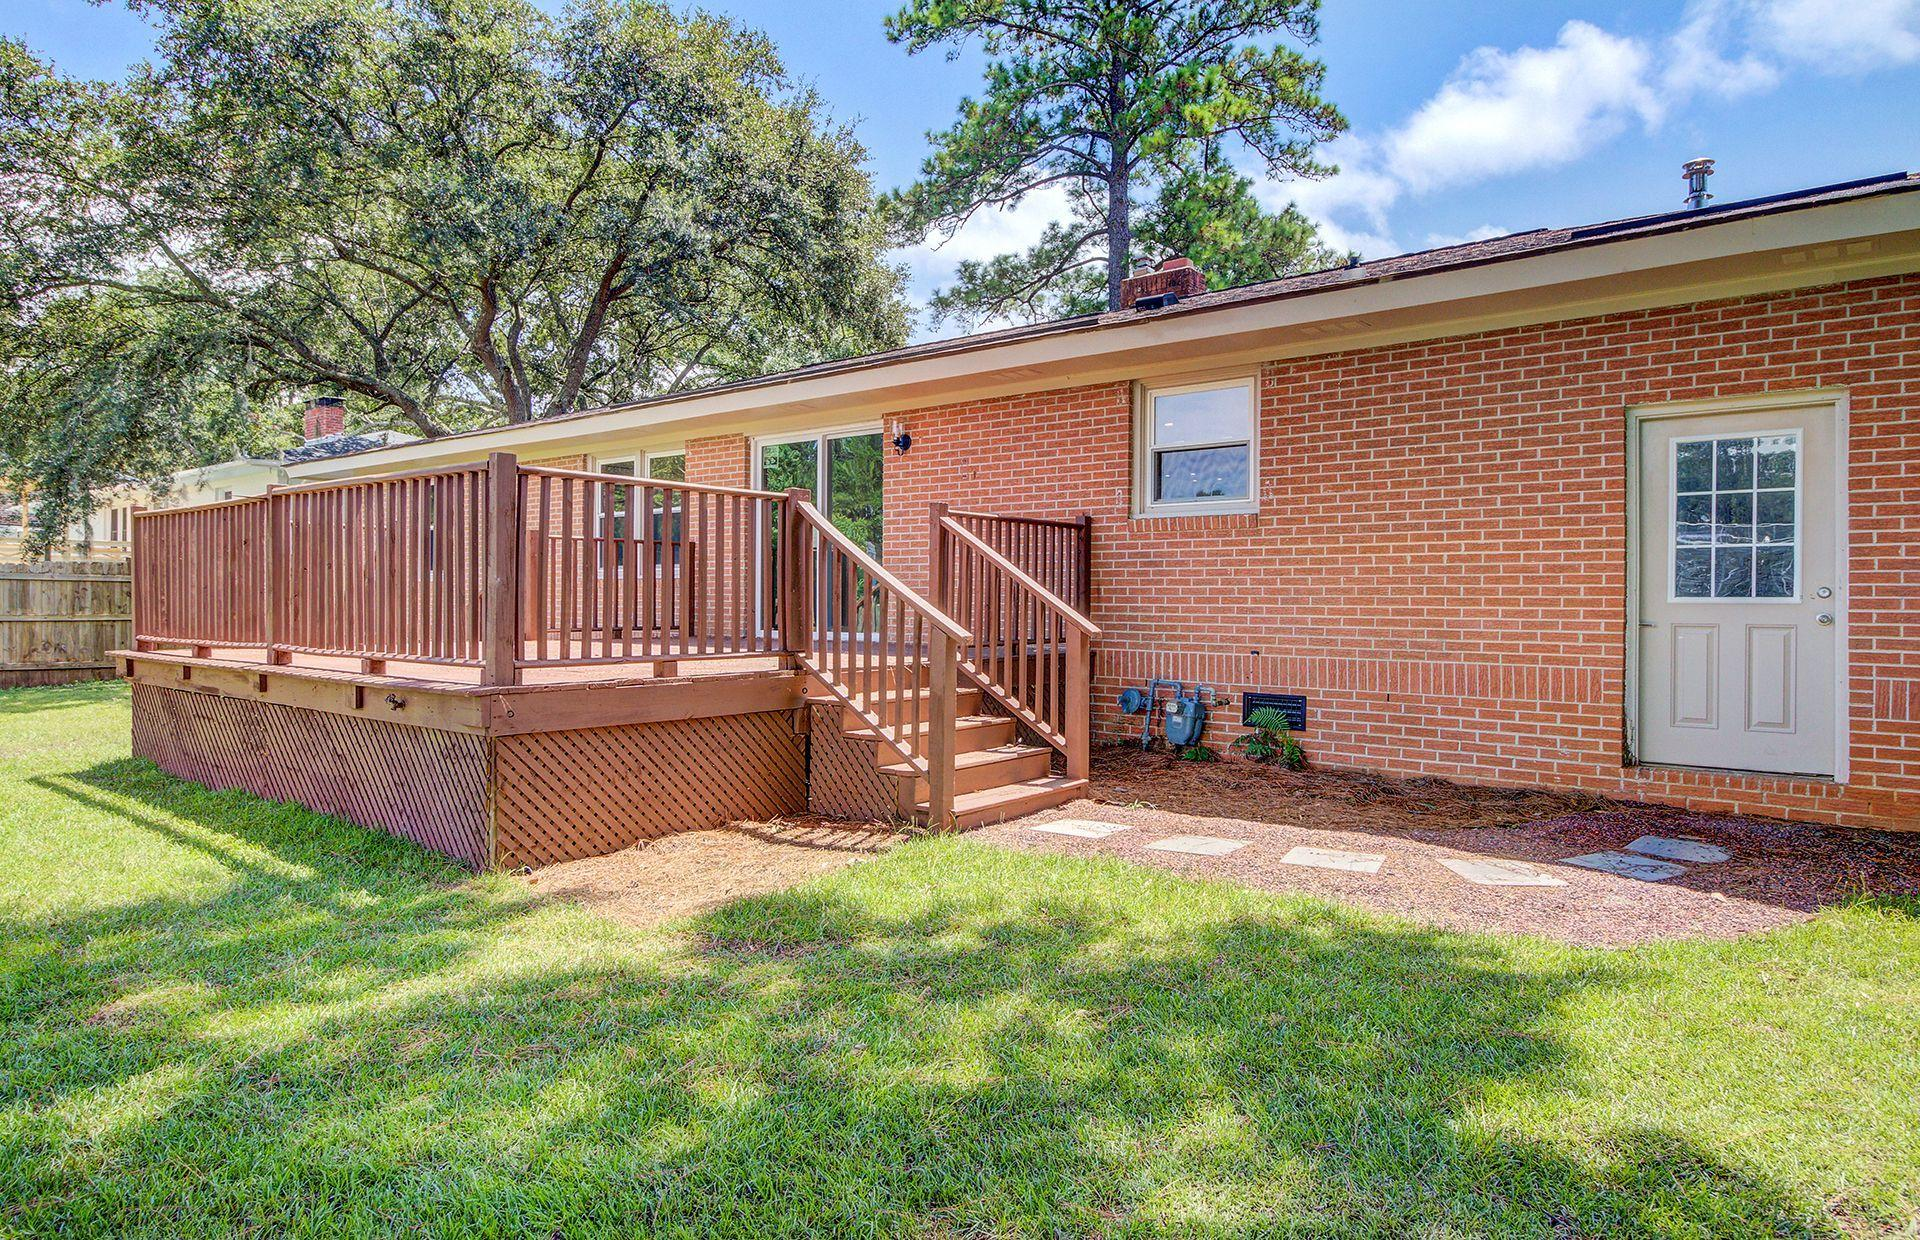 Belvedere Estates Homes For Sale - 6010 Ridgecrest, Hanahan, SC - 32